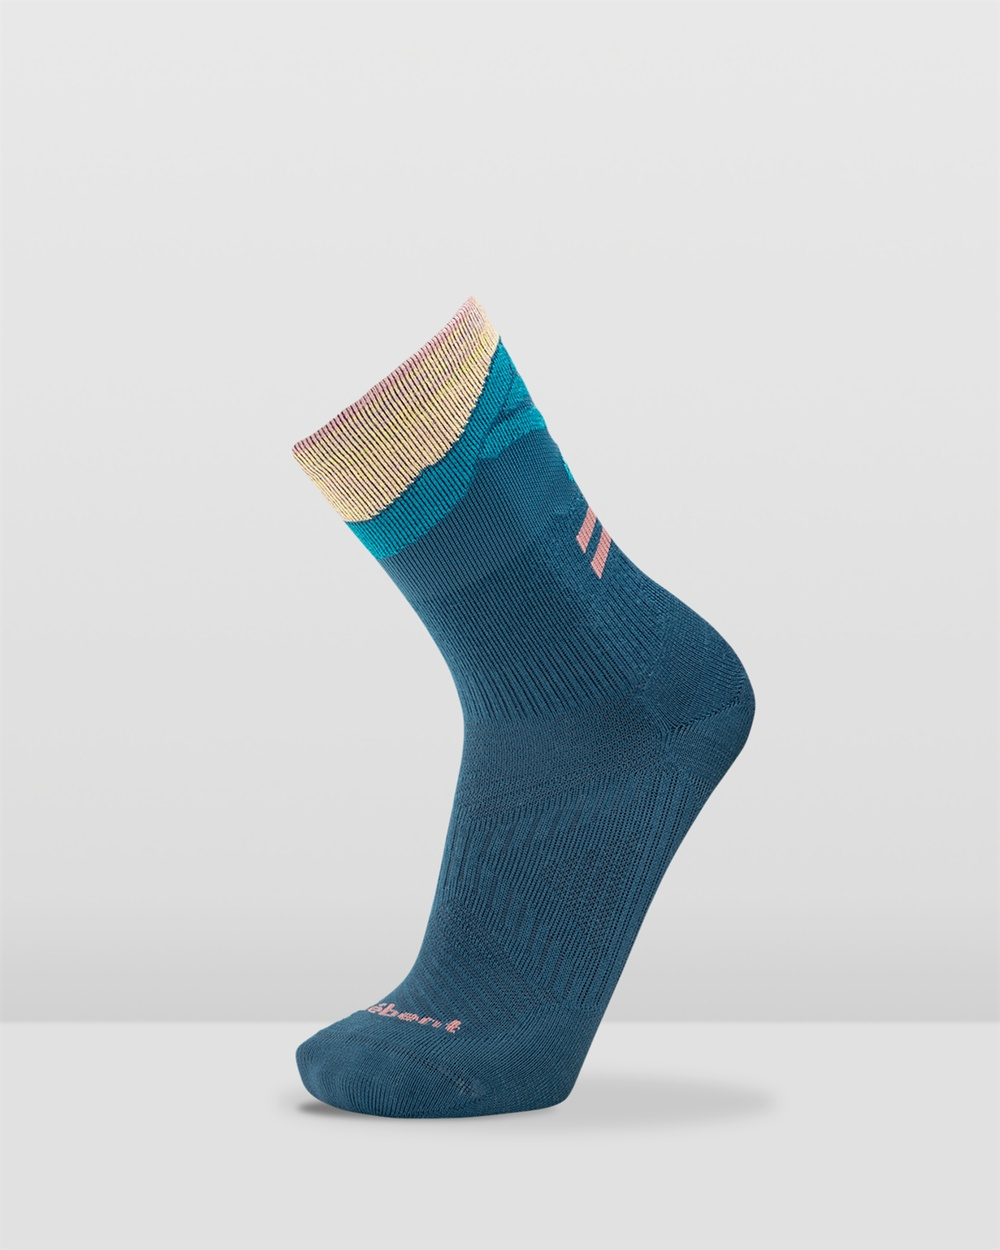 Le Bent Lucy Trail Ultra Light 3 4 Crew Socks Blue 3-4